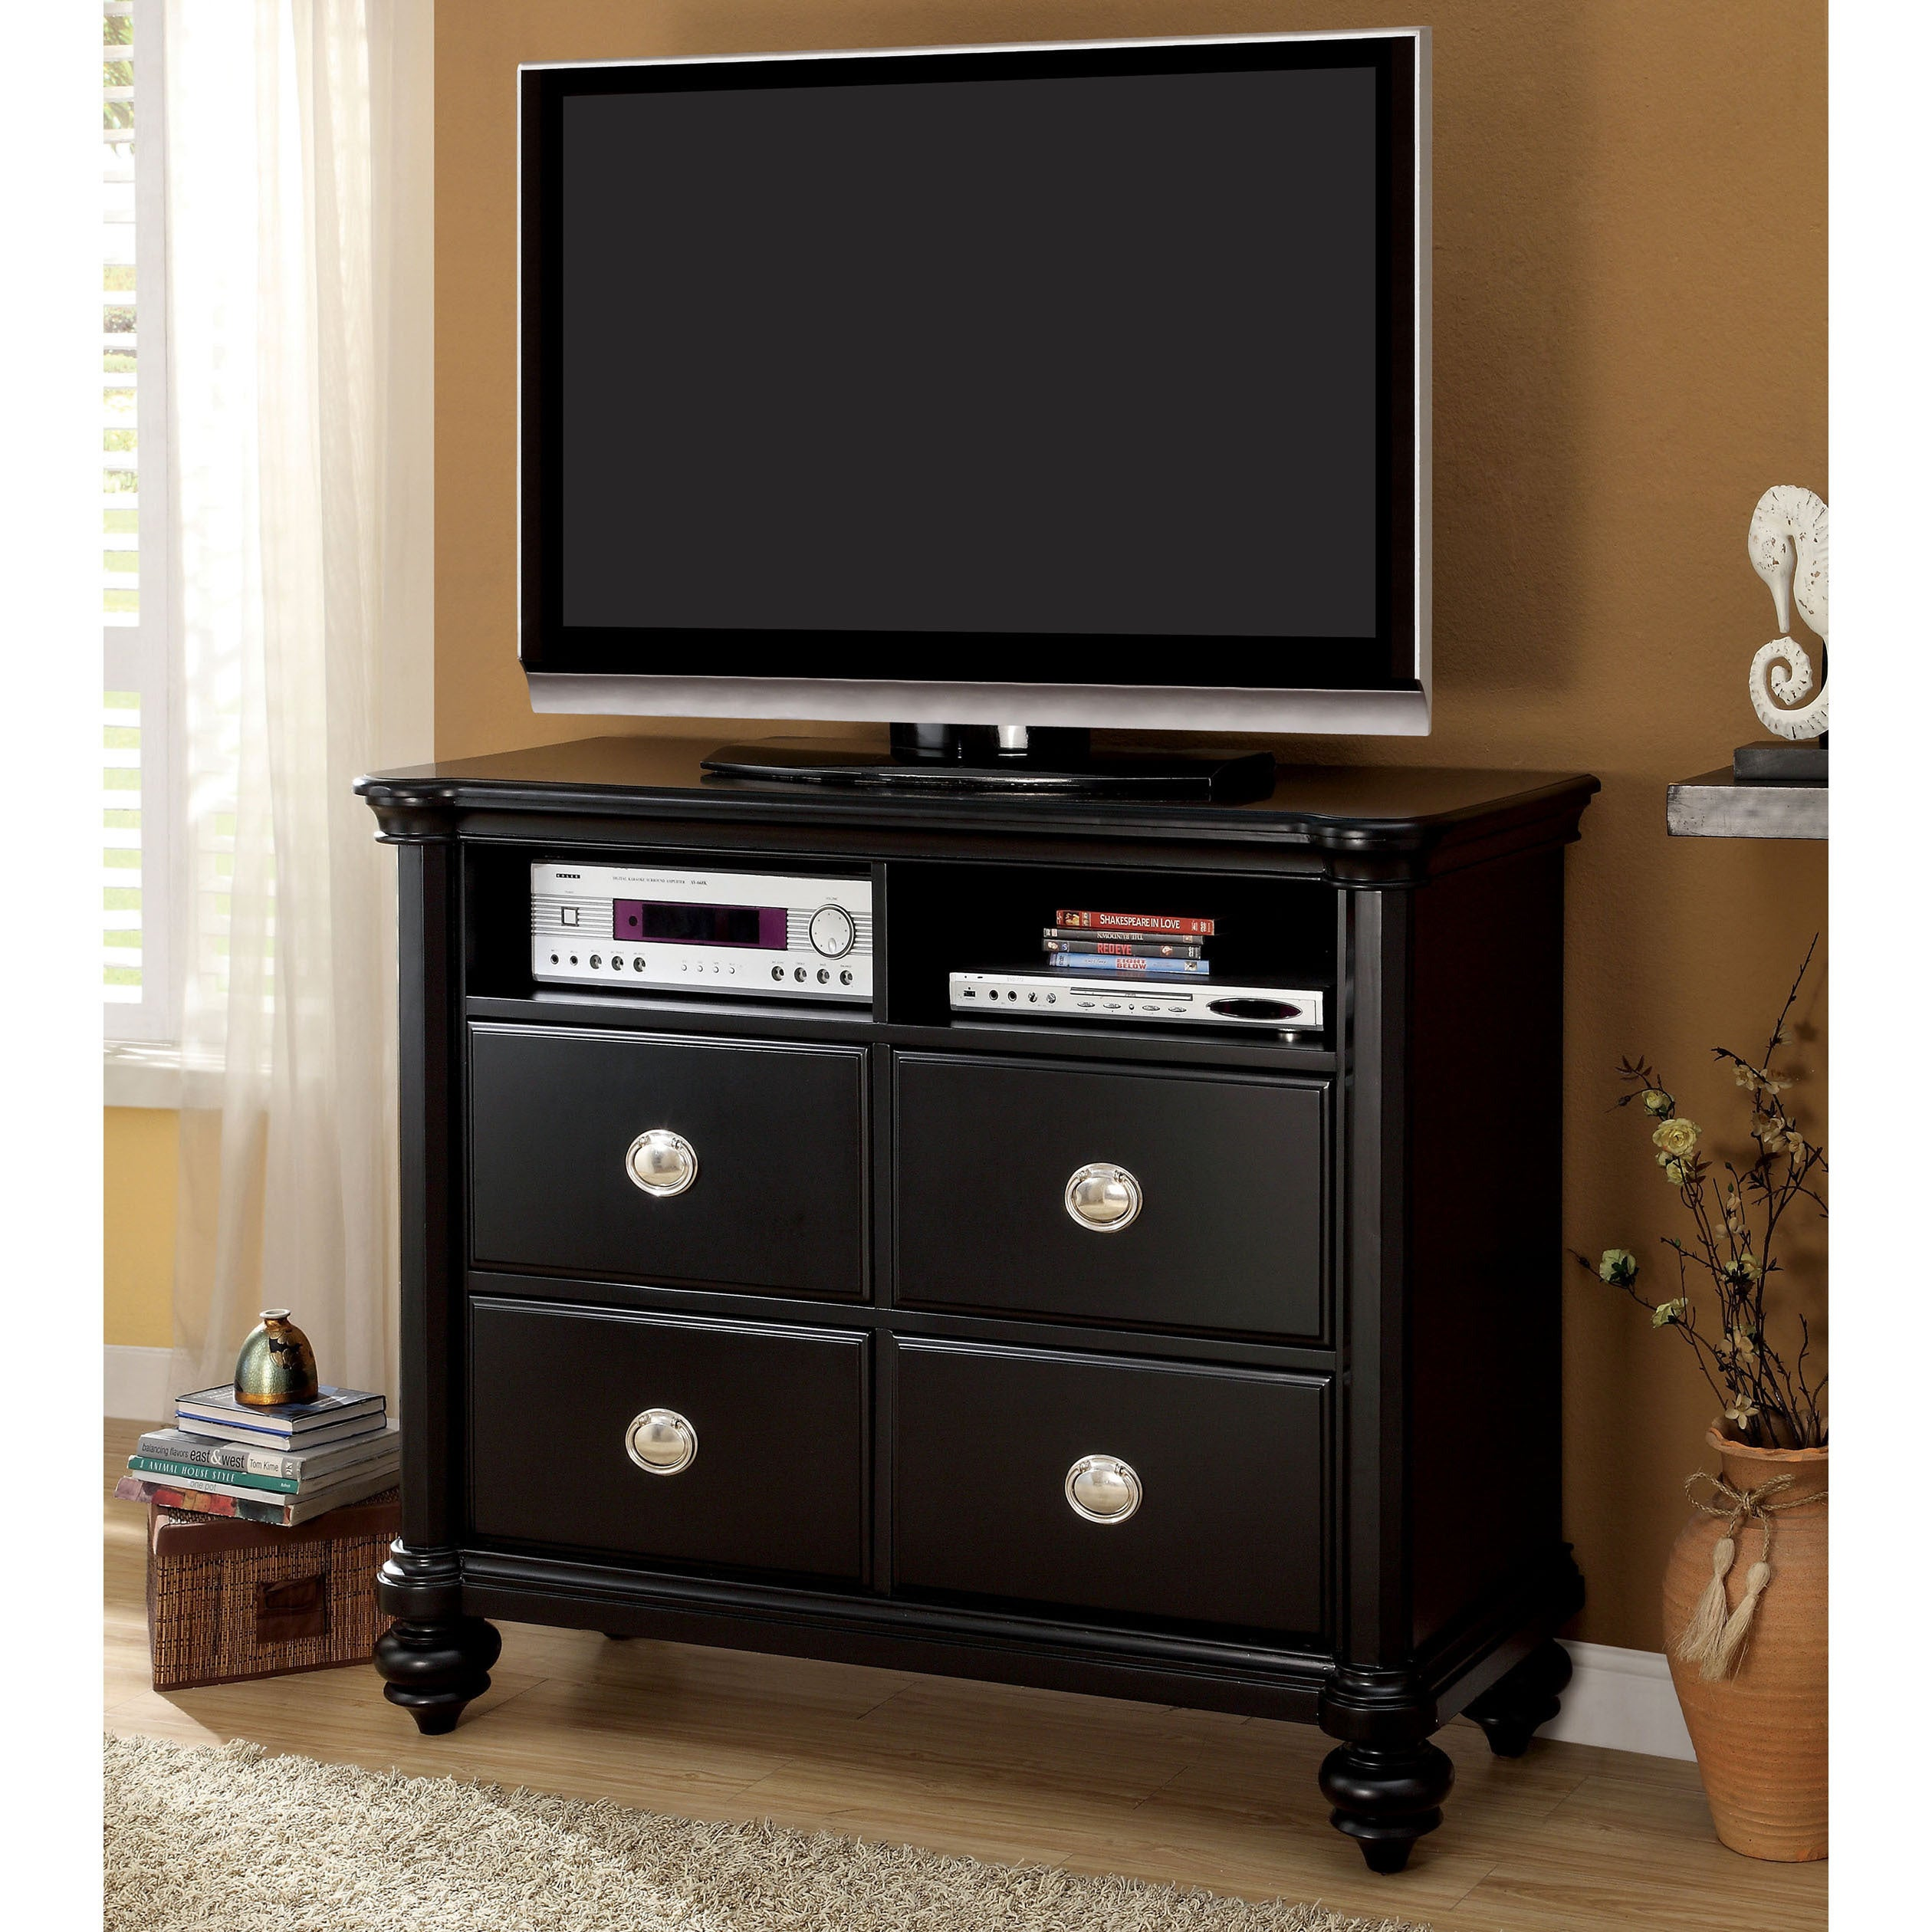 Furniture of America Selinea Modern Black Media Chest (Bl...